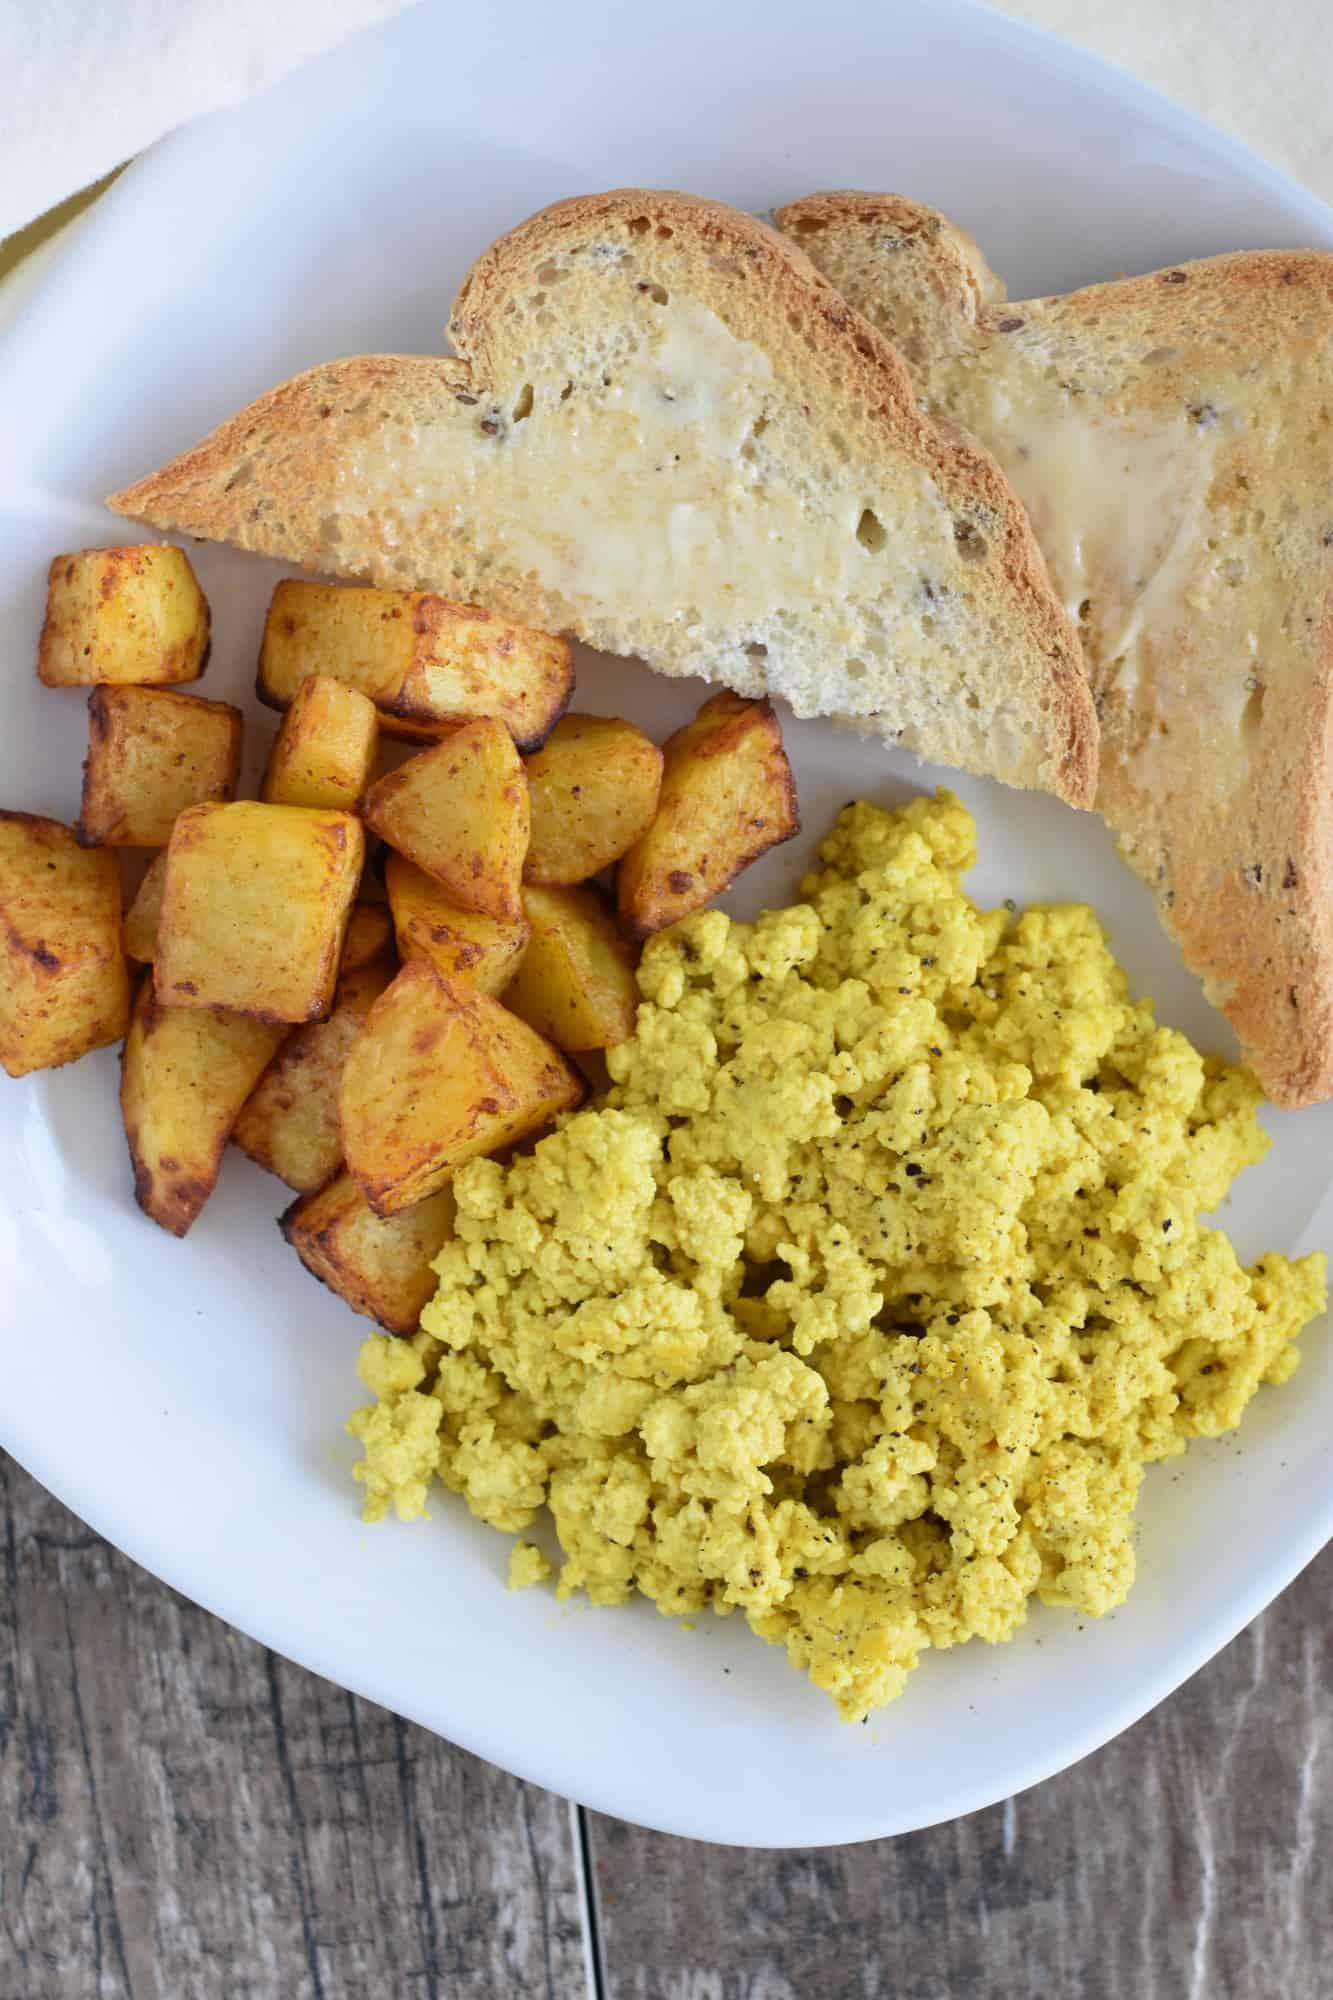 potatoes on a white plate next to tofu scramble and toast